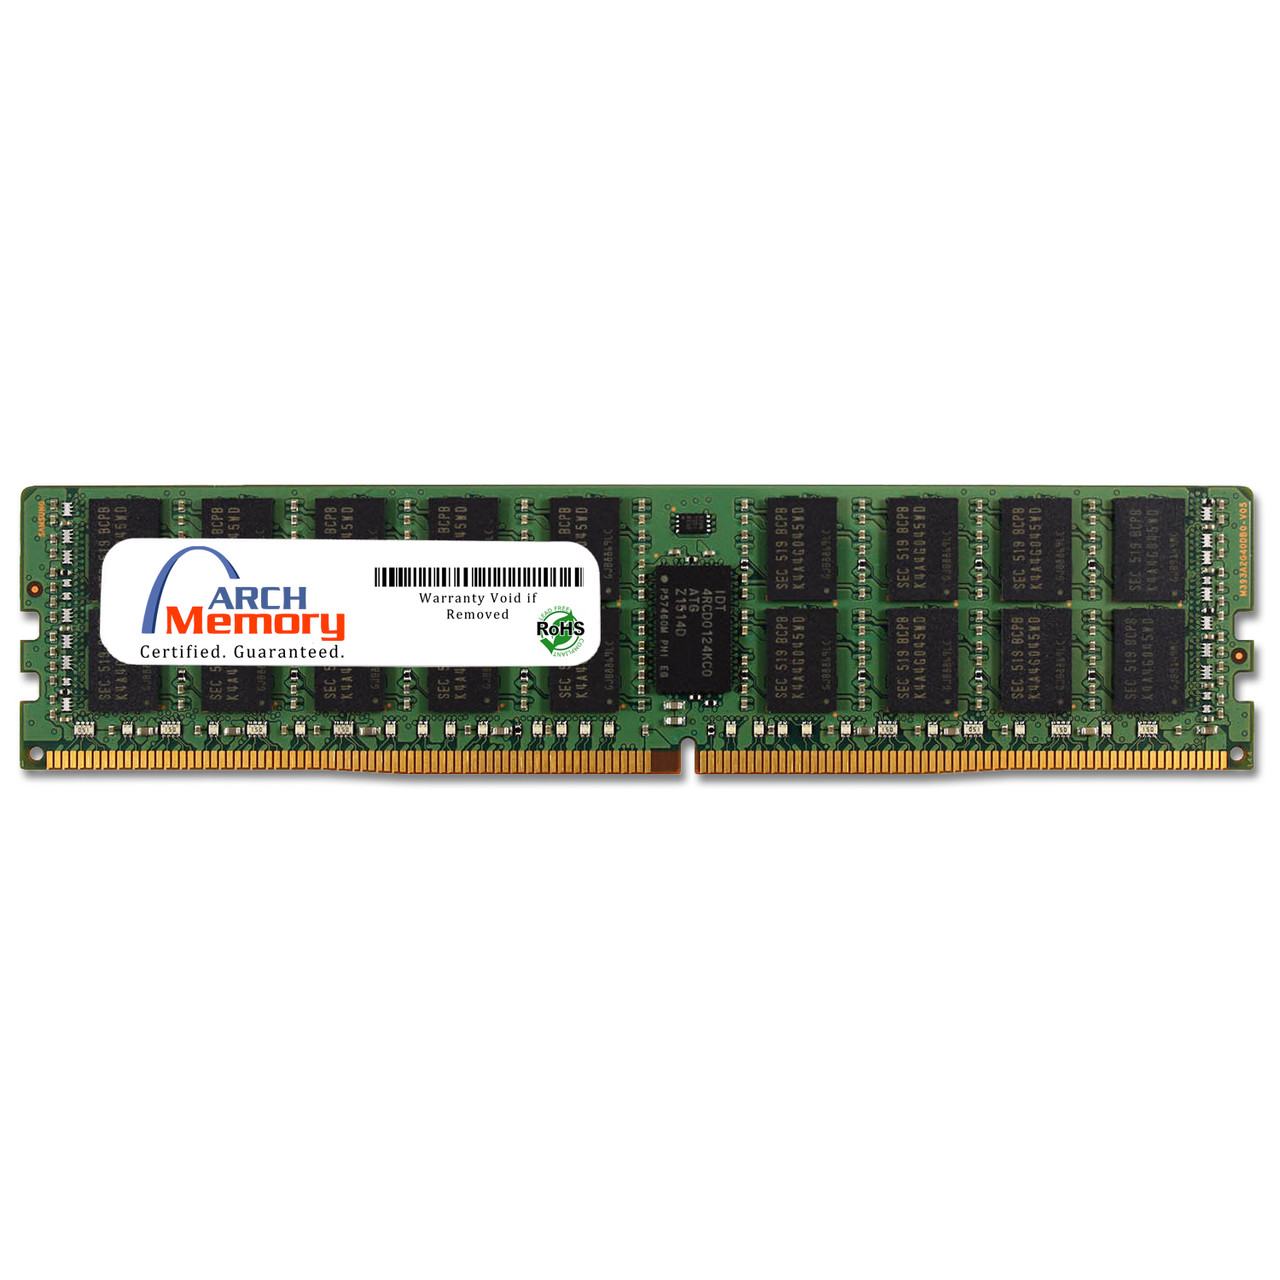 Cisco UCS-MR-1X162RU-A 16 GB 288-Pin DDR4 2133 MHz RDIMM RAM